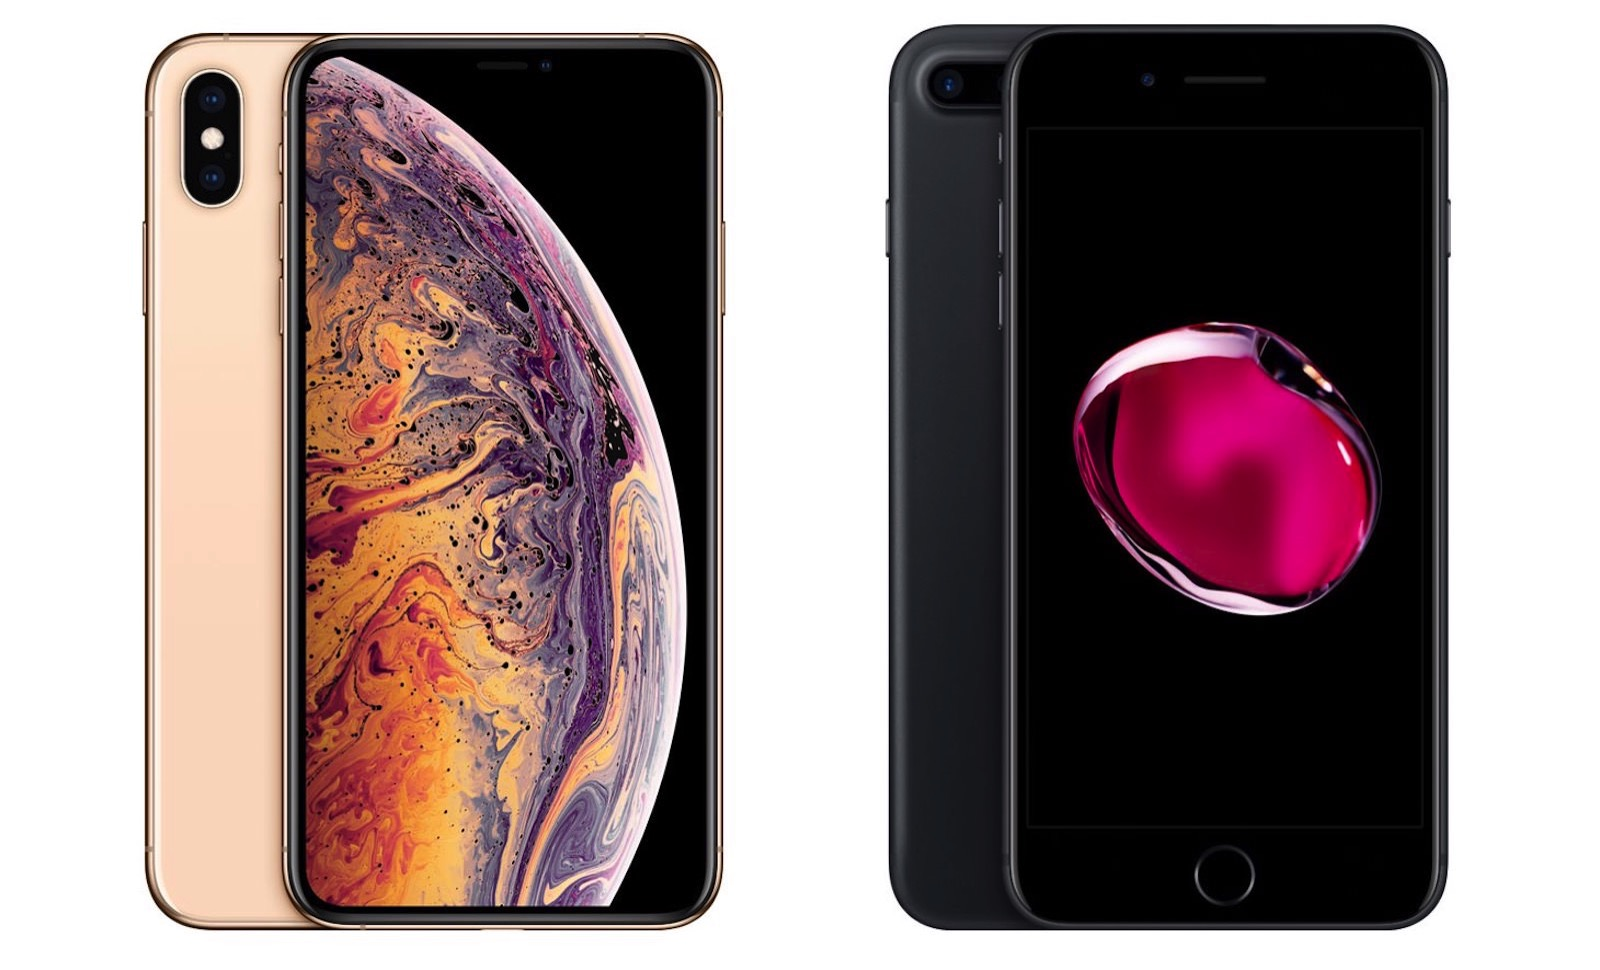 iphone-xs-max-vs-7-plus.jpg